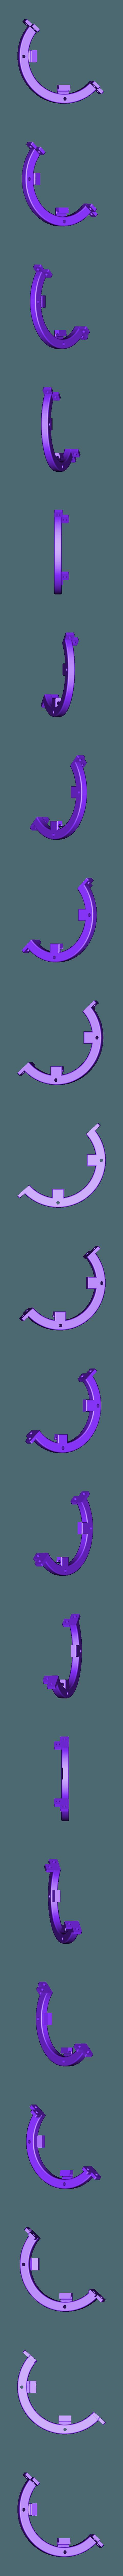 BoomExteriorTop_SIDE2.stl Download free STL file MXL 4000 Shock Mount (Custom) • 3D printer object, ProteanMan